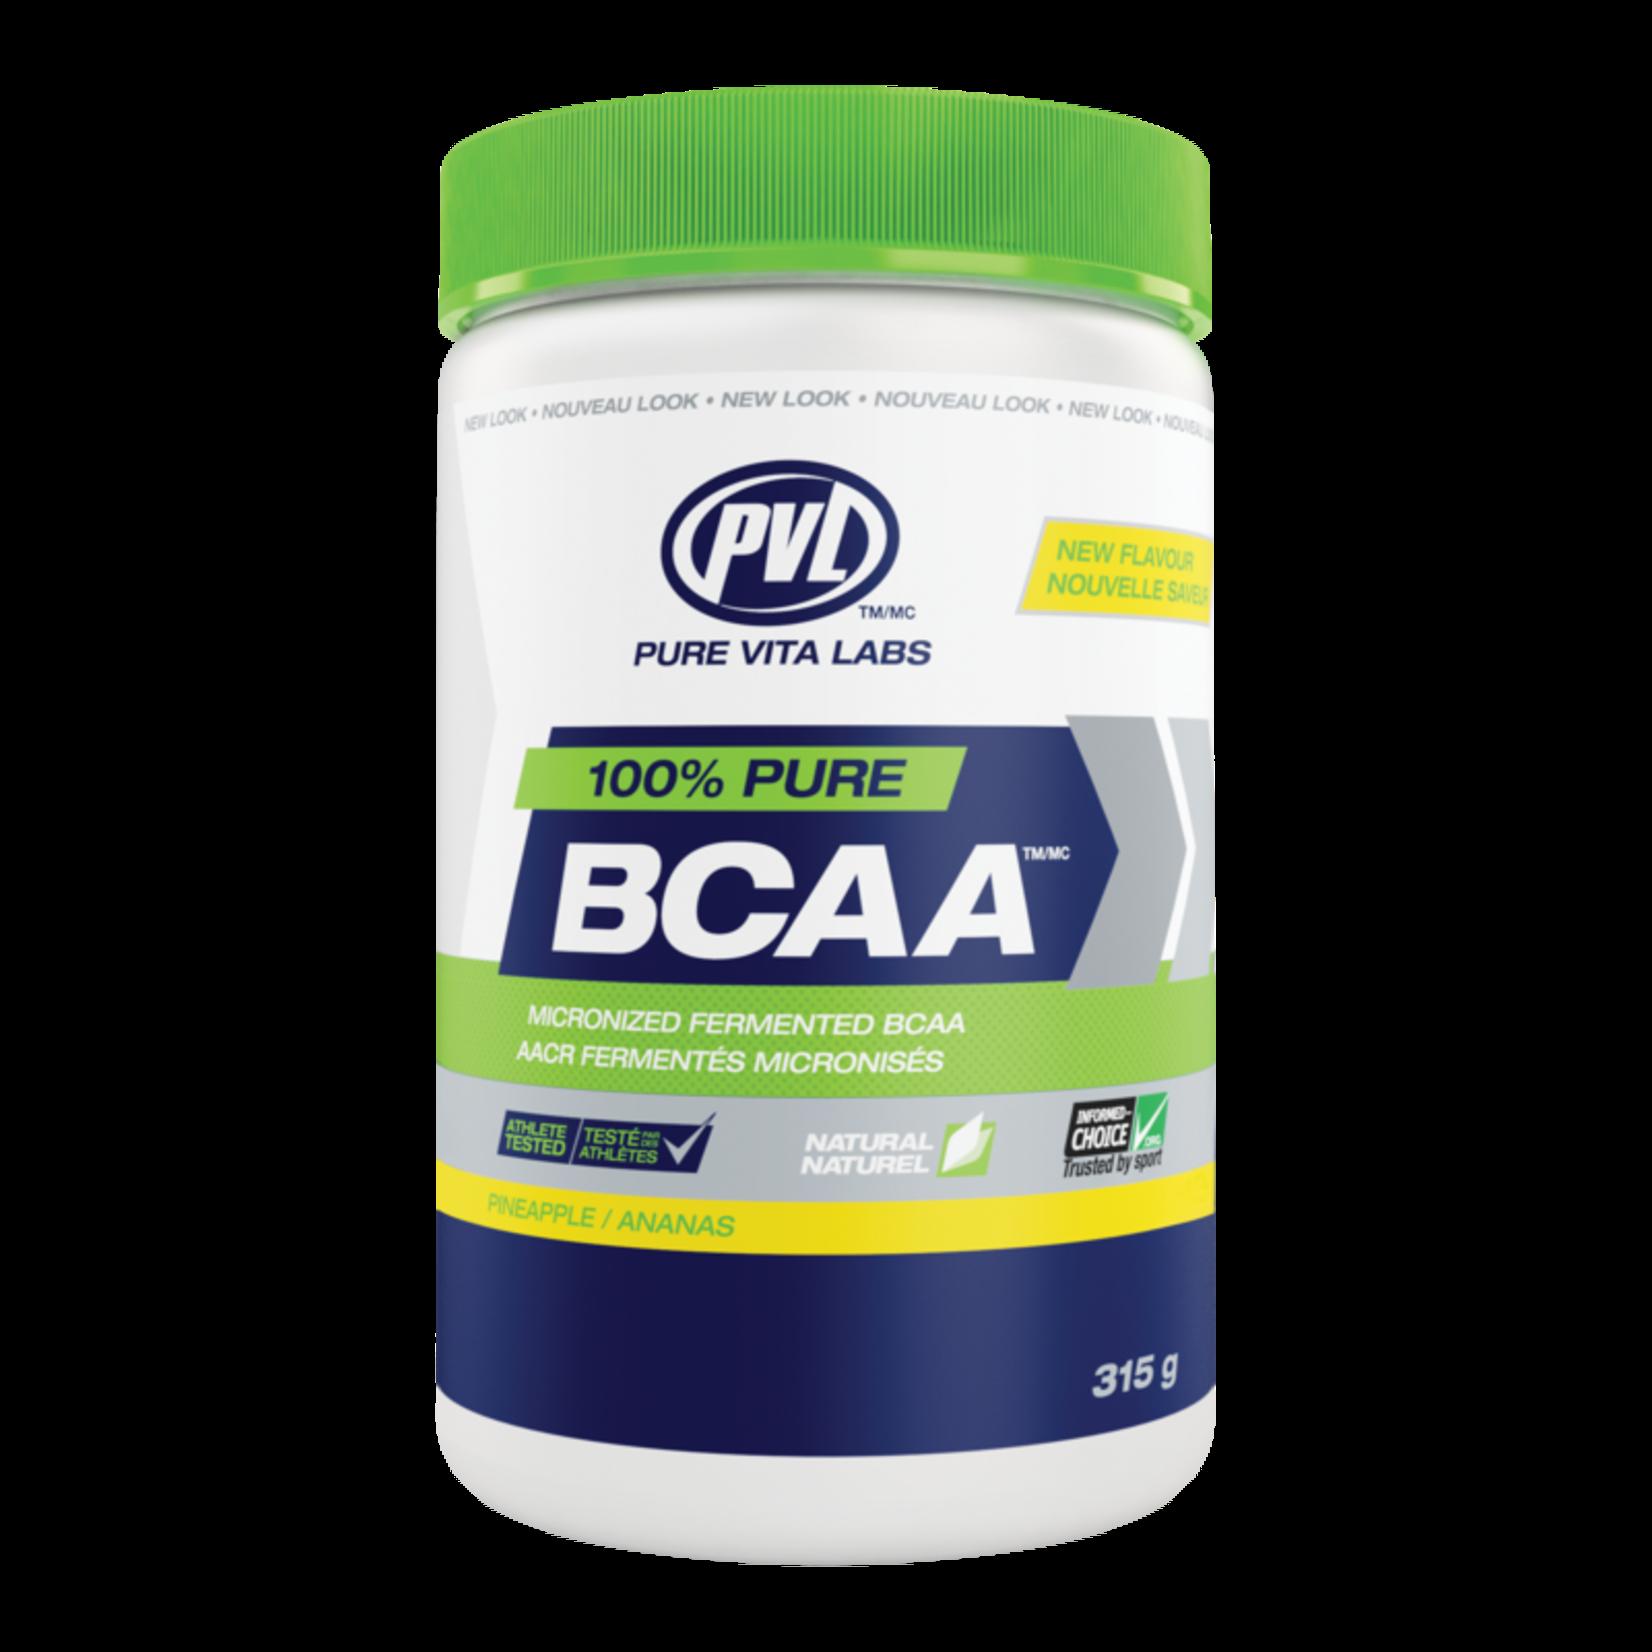 Pure Vita Labs 100% Pure BCAA - Pineapple 315g